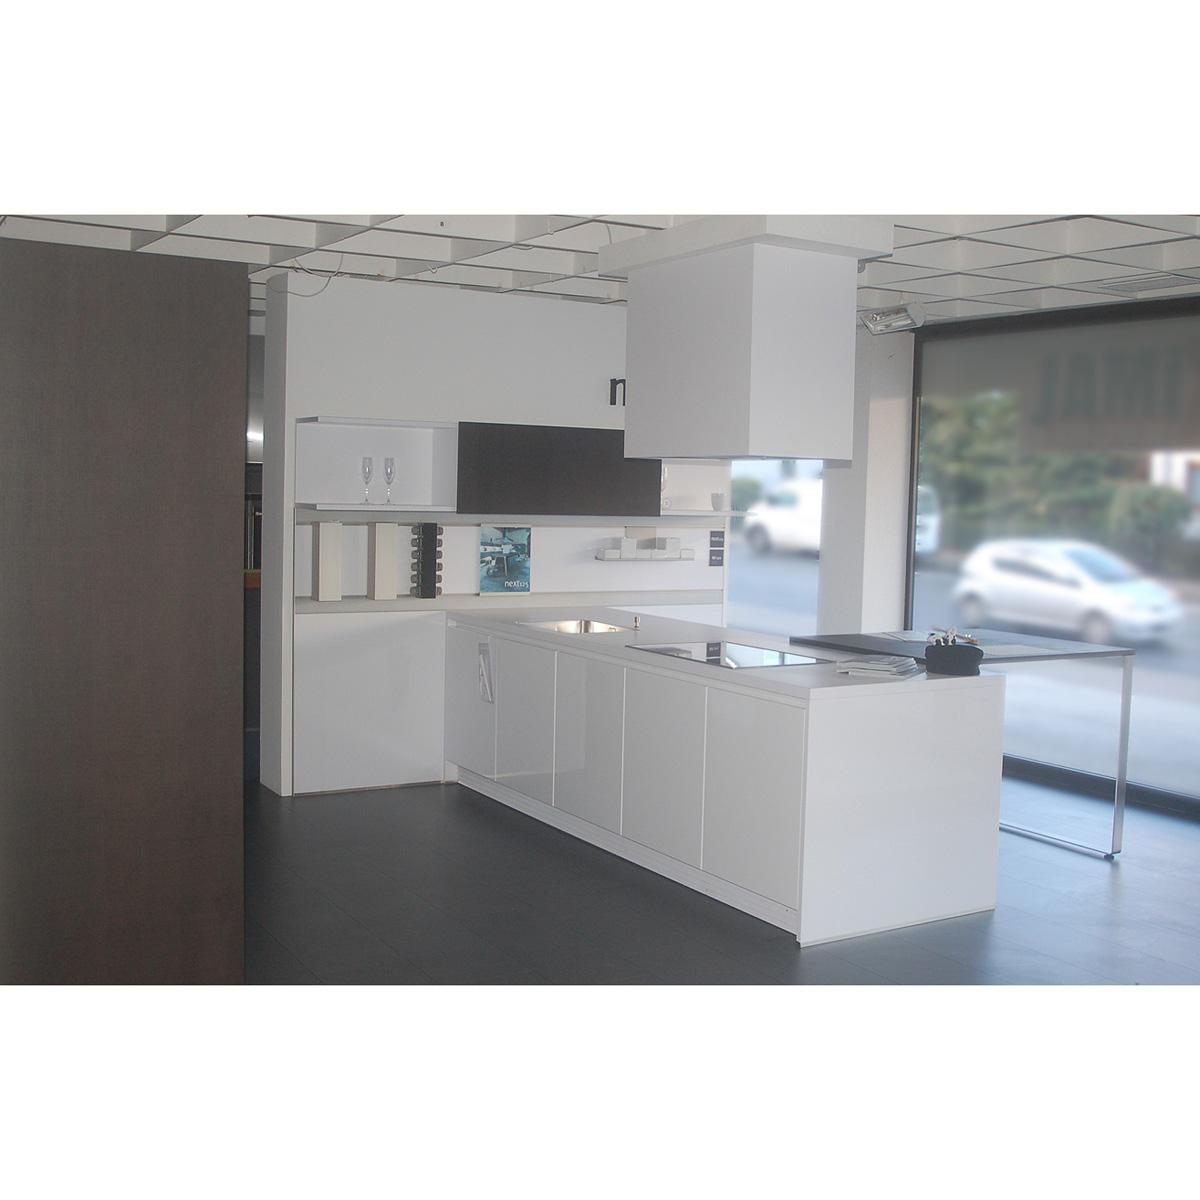 küche weiß hochglanz ohne griffe ~ Logisting.com = Elegante Interior ...